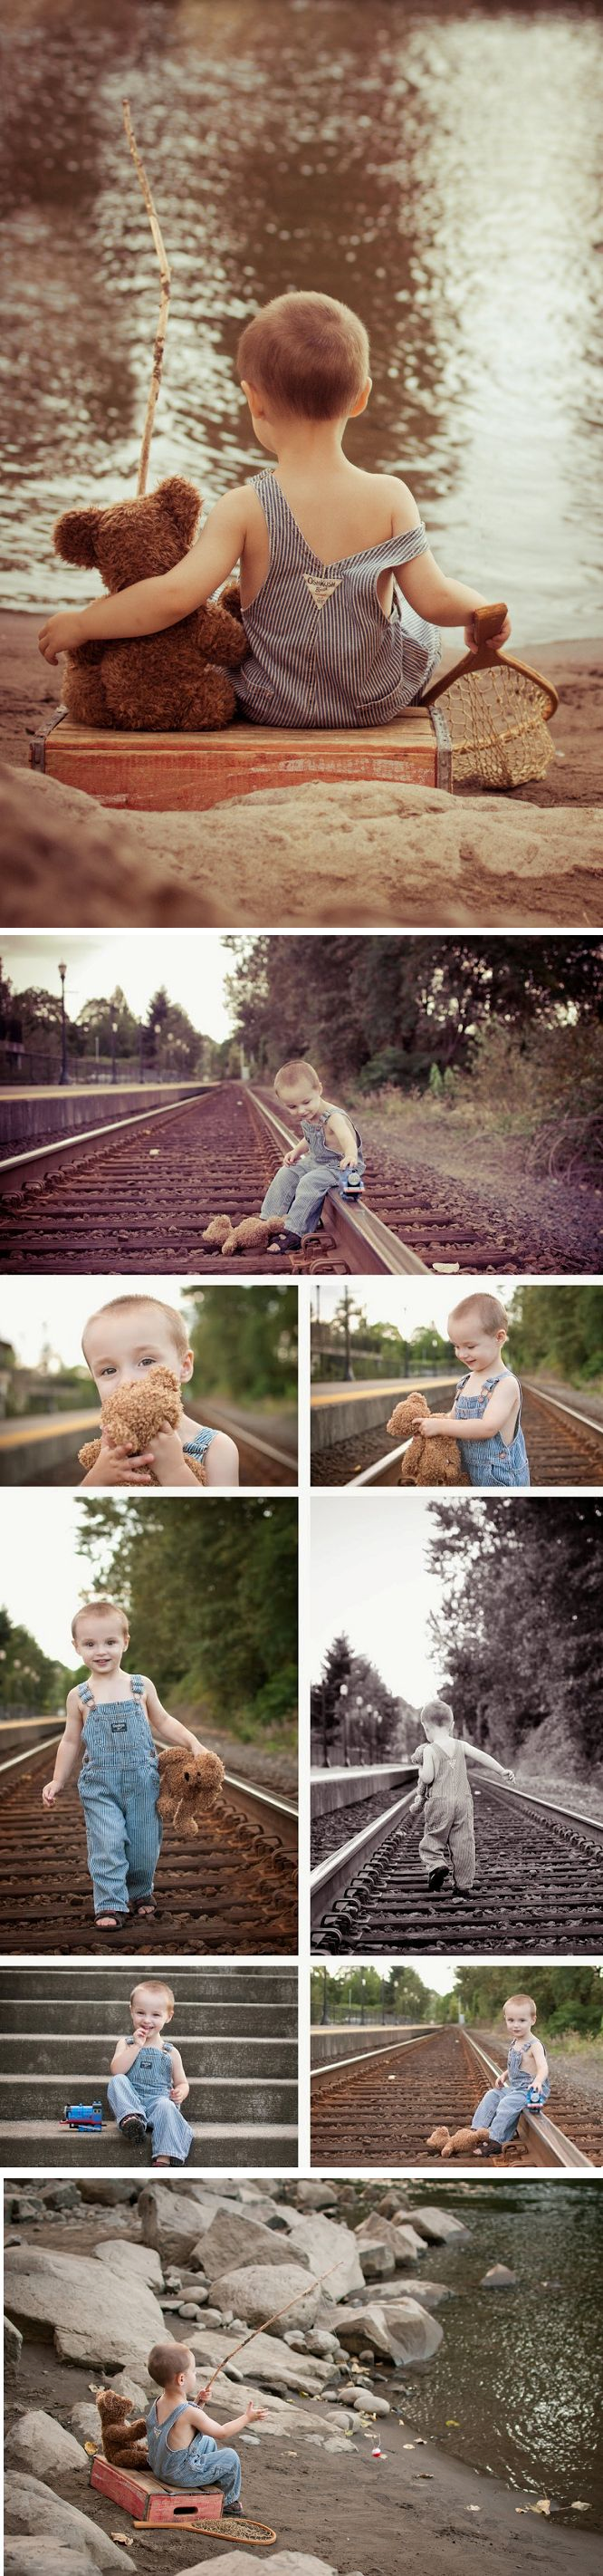 Two Years Old~ Oregon City Portrait Photographer / On Location /  © Robinwood Photography